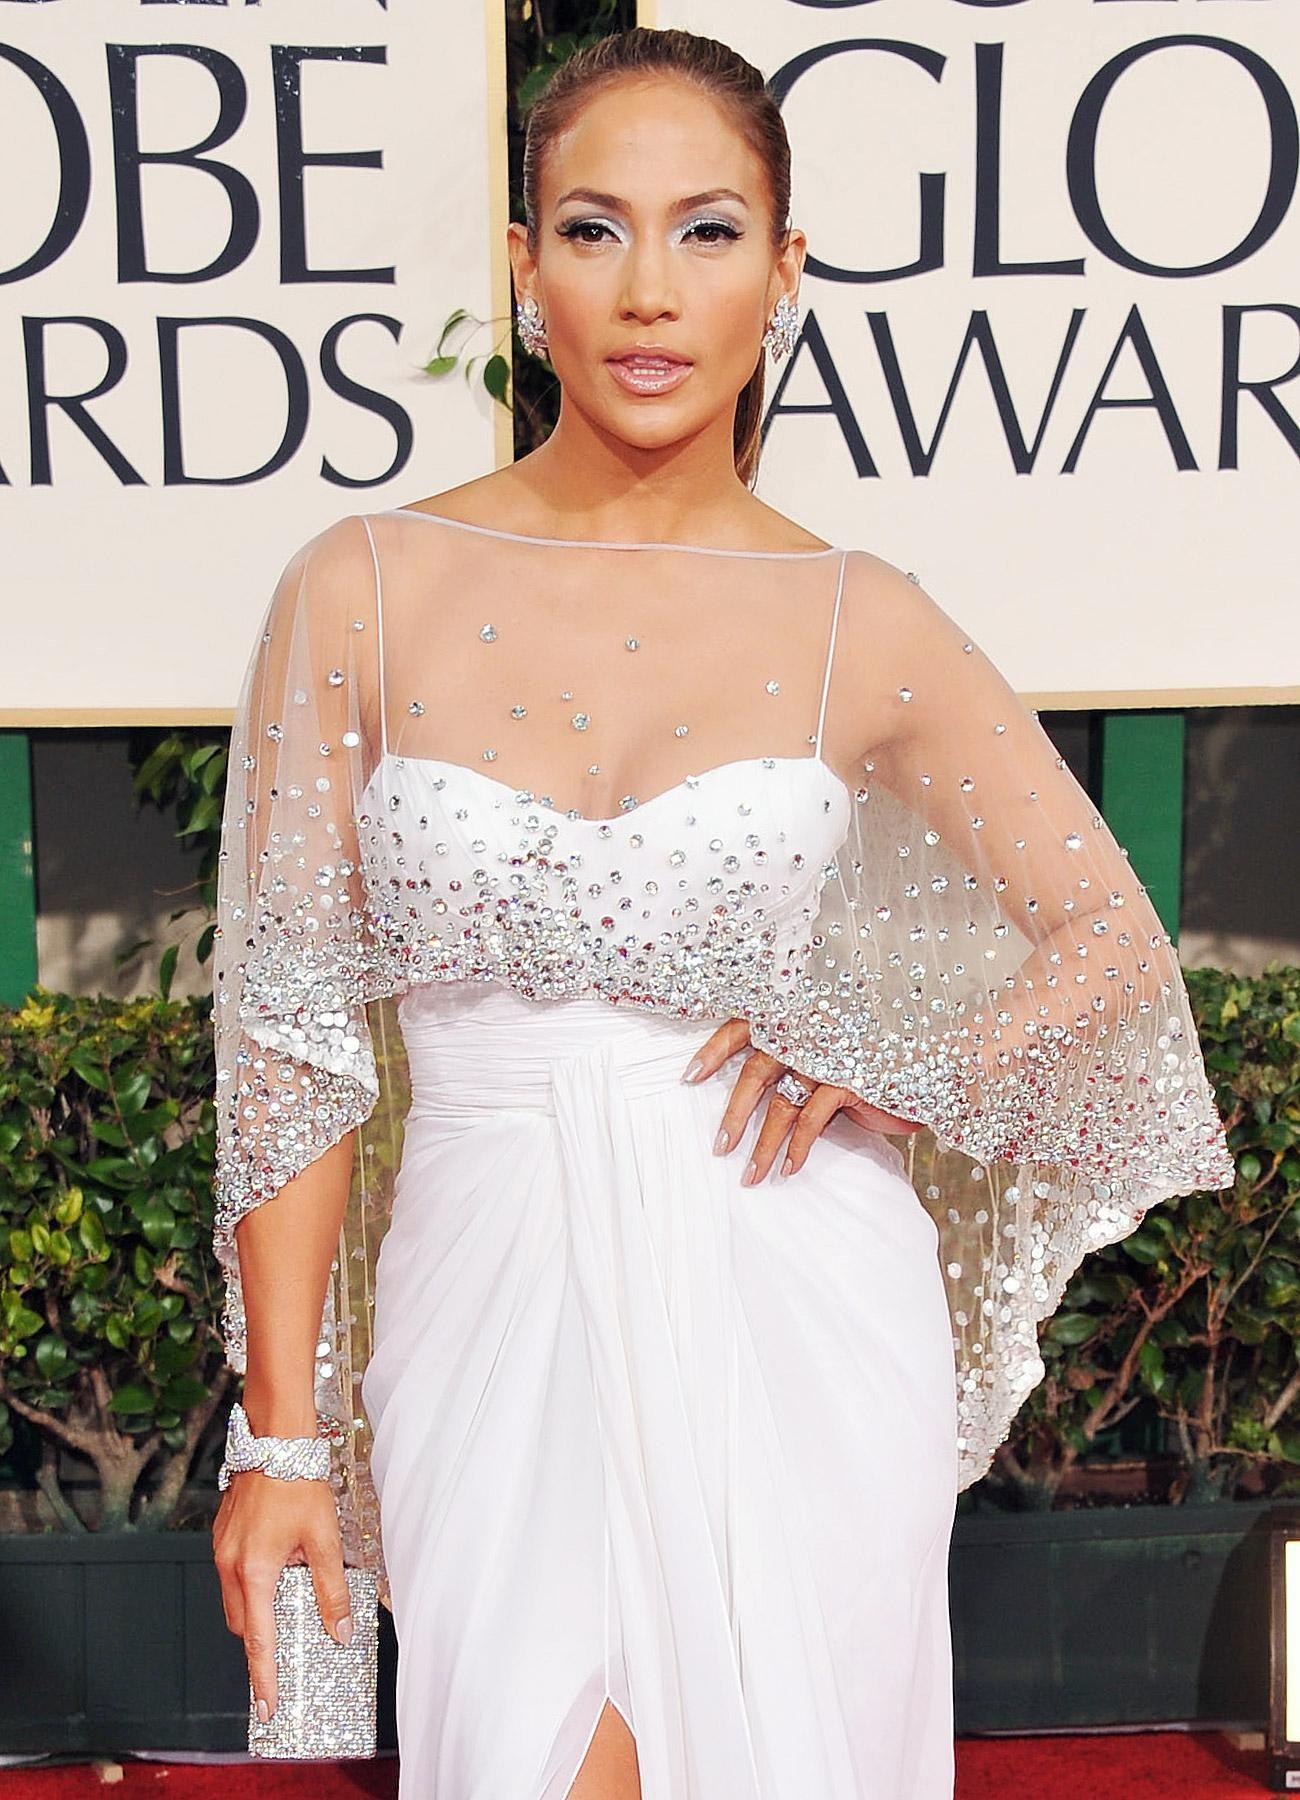 Jlo wedding dress  Jennifer Lopez Engagement Ring From Ben Affleck   Cut  Pinterest